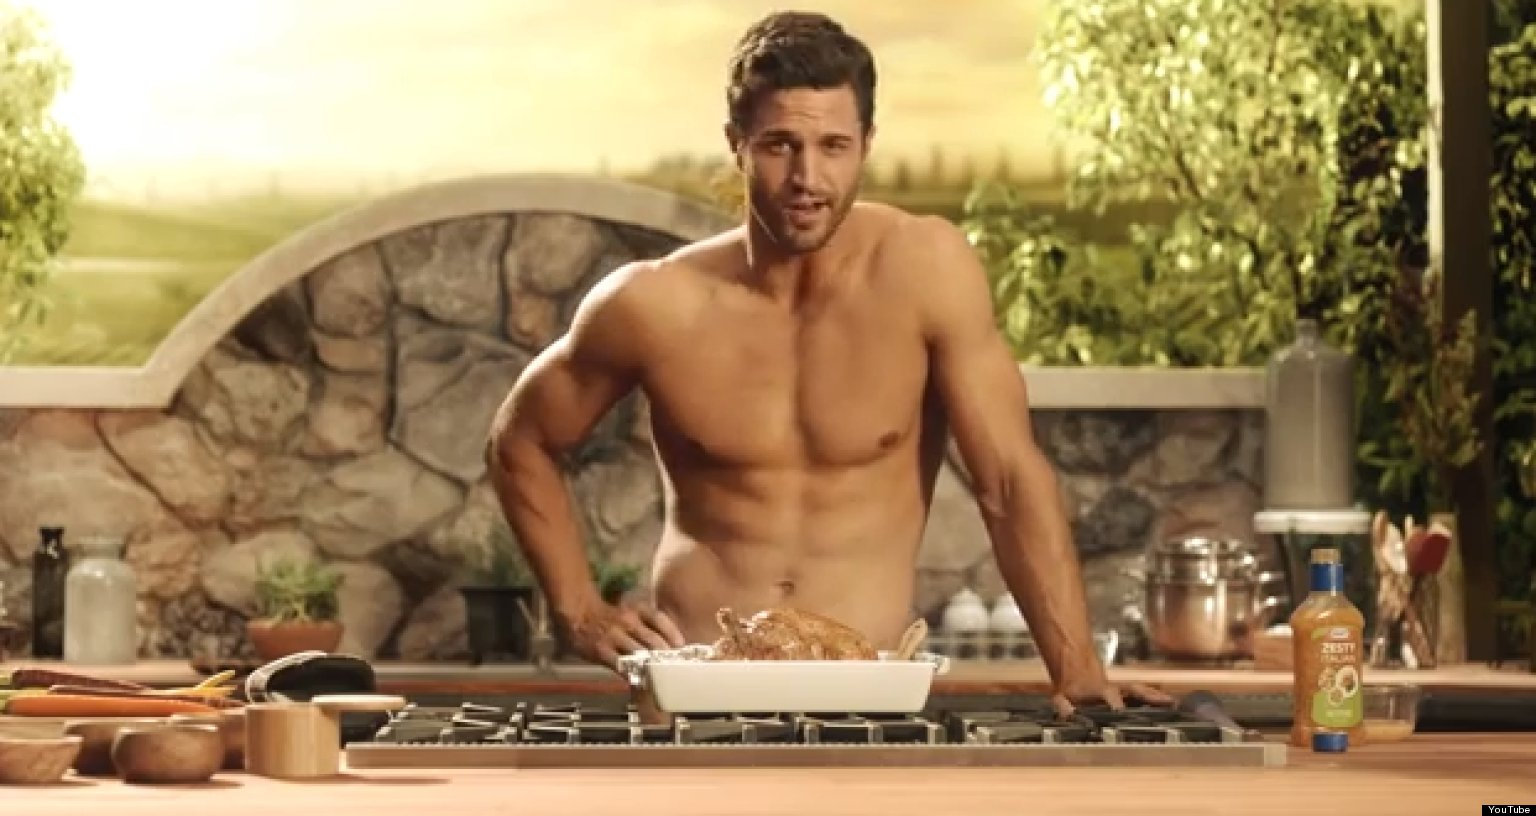 Shirtless Men The New Big Thing In Advertising  Huffpost-3448